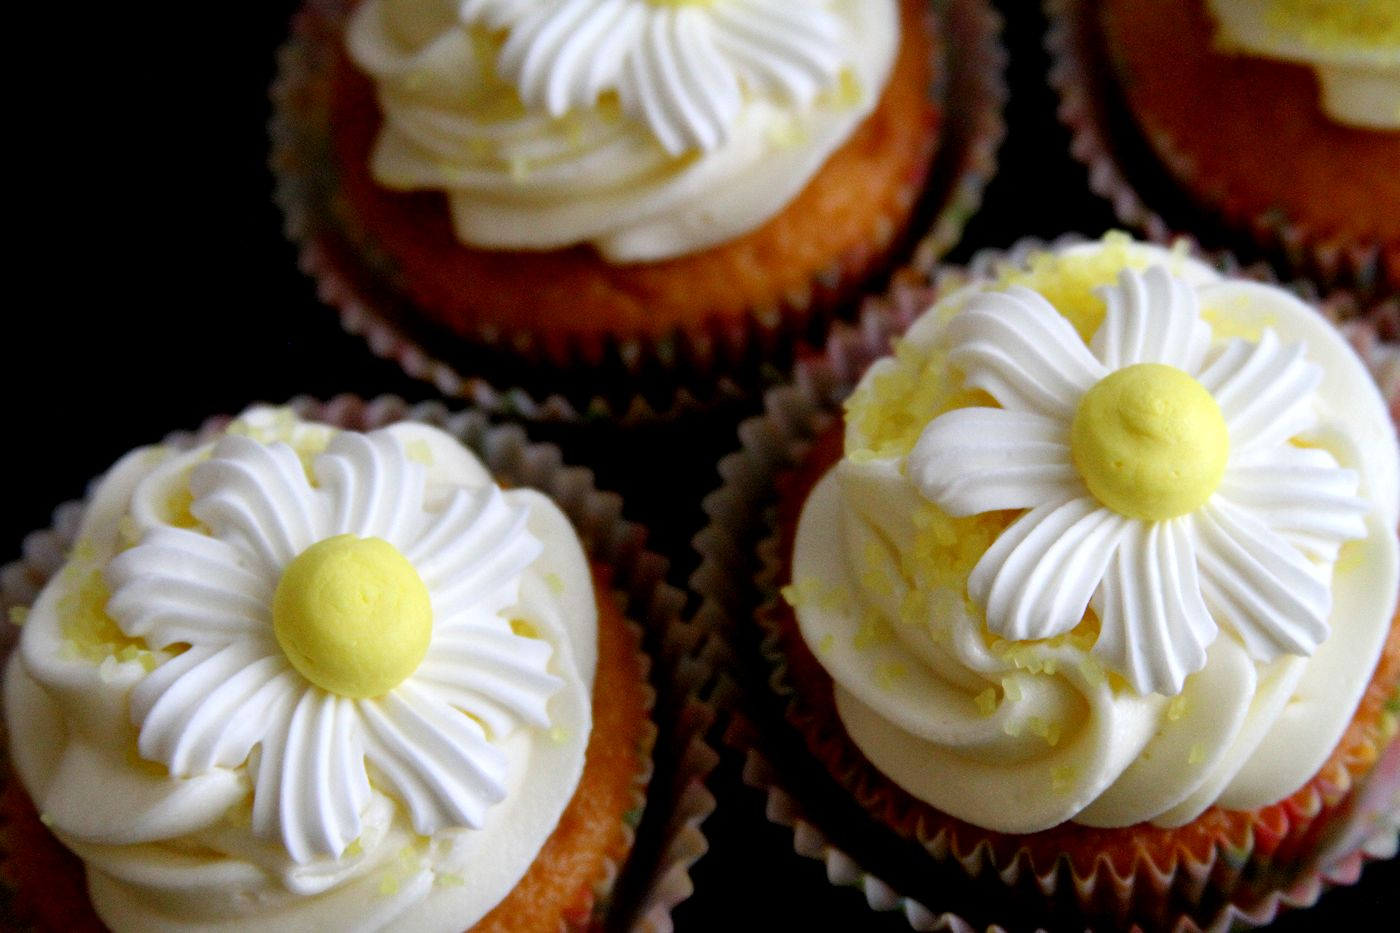 ... Inside Meyer Lemon Cupcakes – A Cup of Sugar … A Pinch of Salt